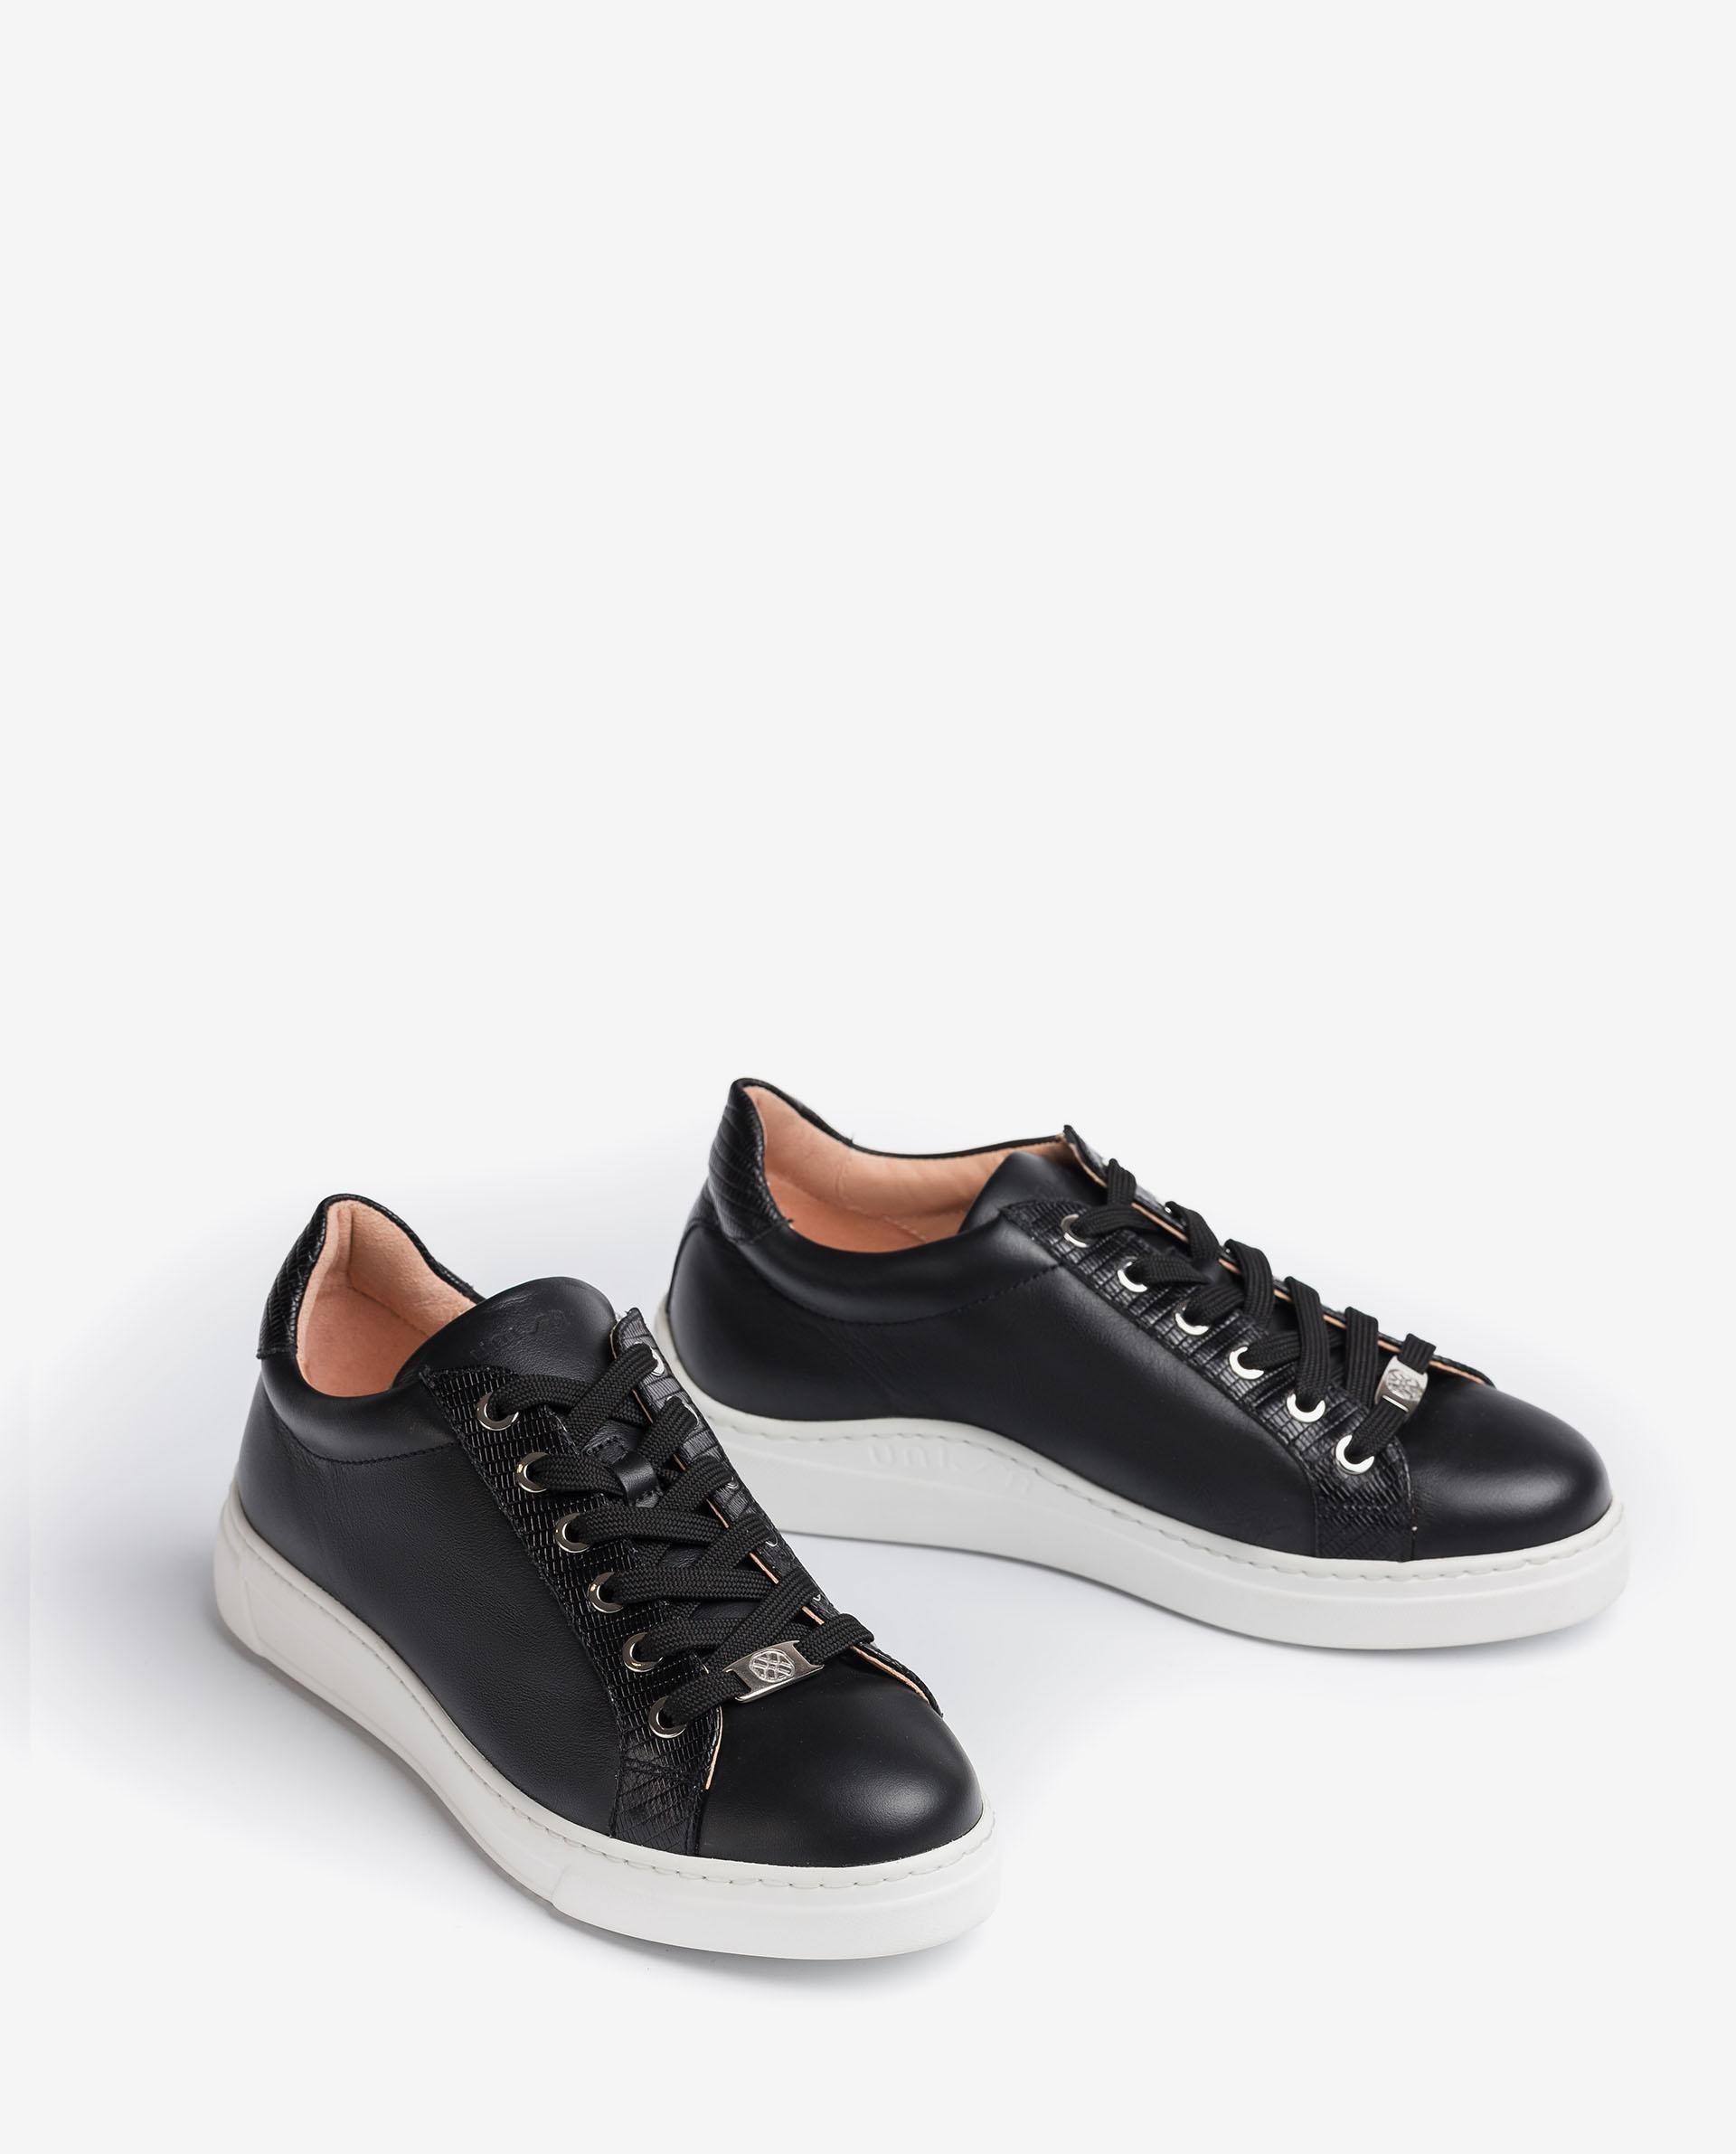 UNISA Contrast leather sneakers FRANCI_21_NF_BTJ 2